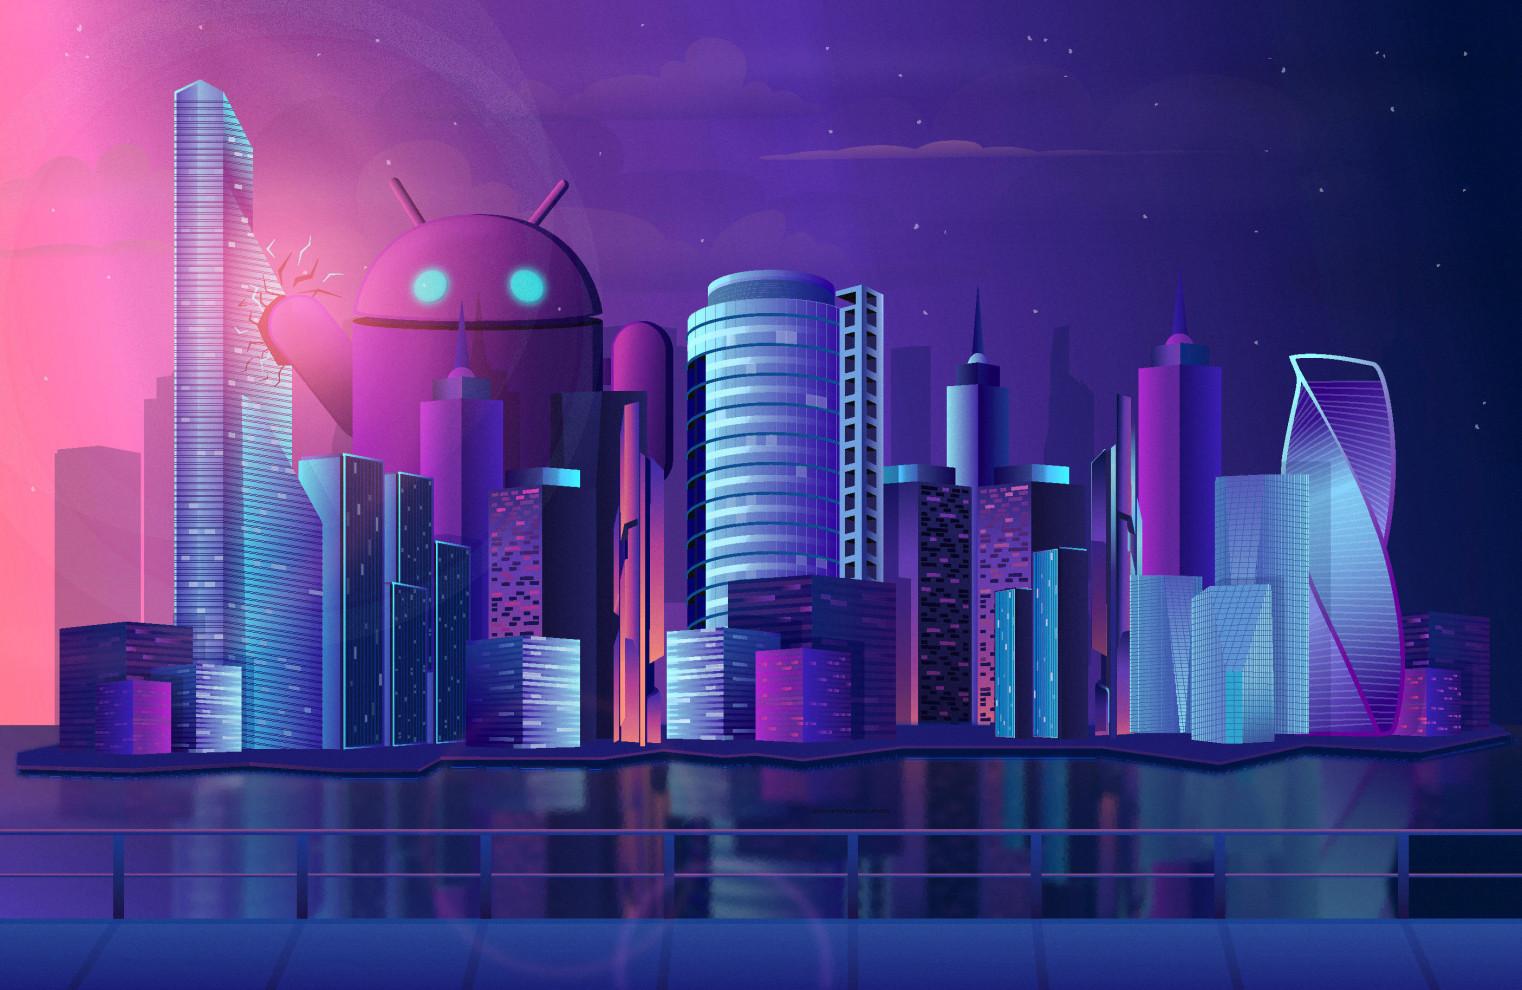 Android irrompe in città